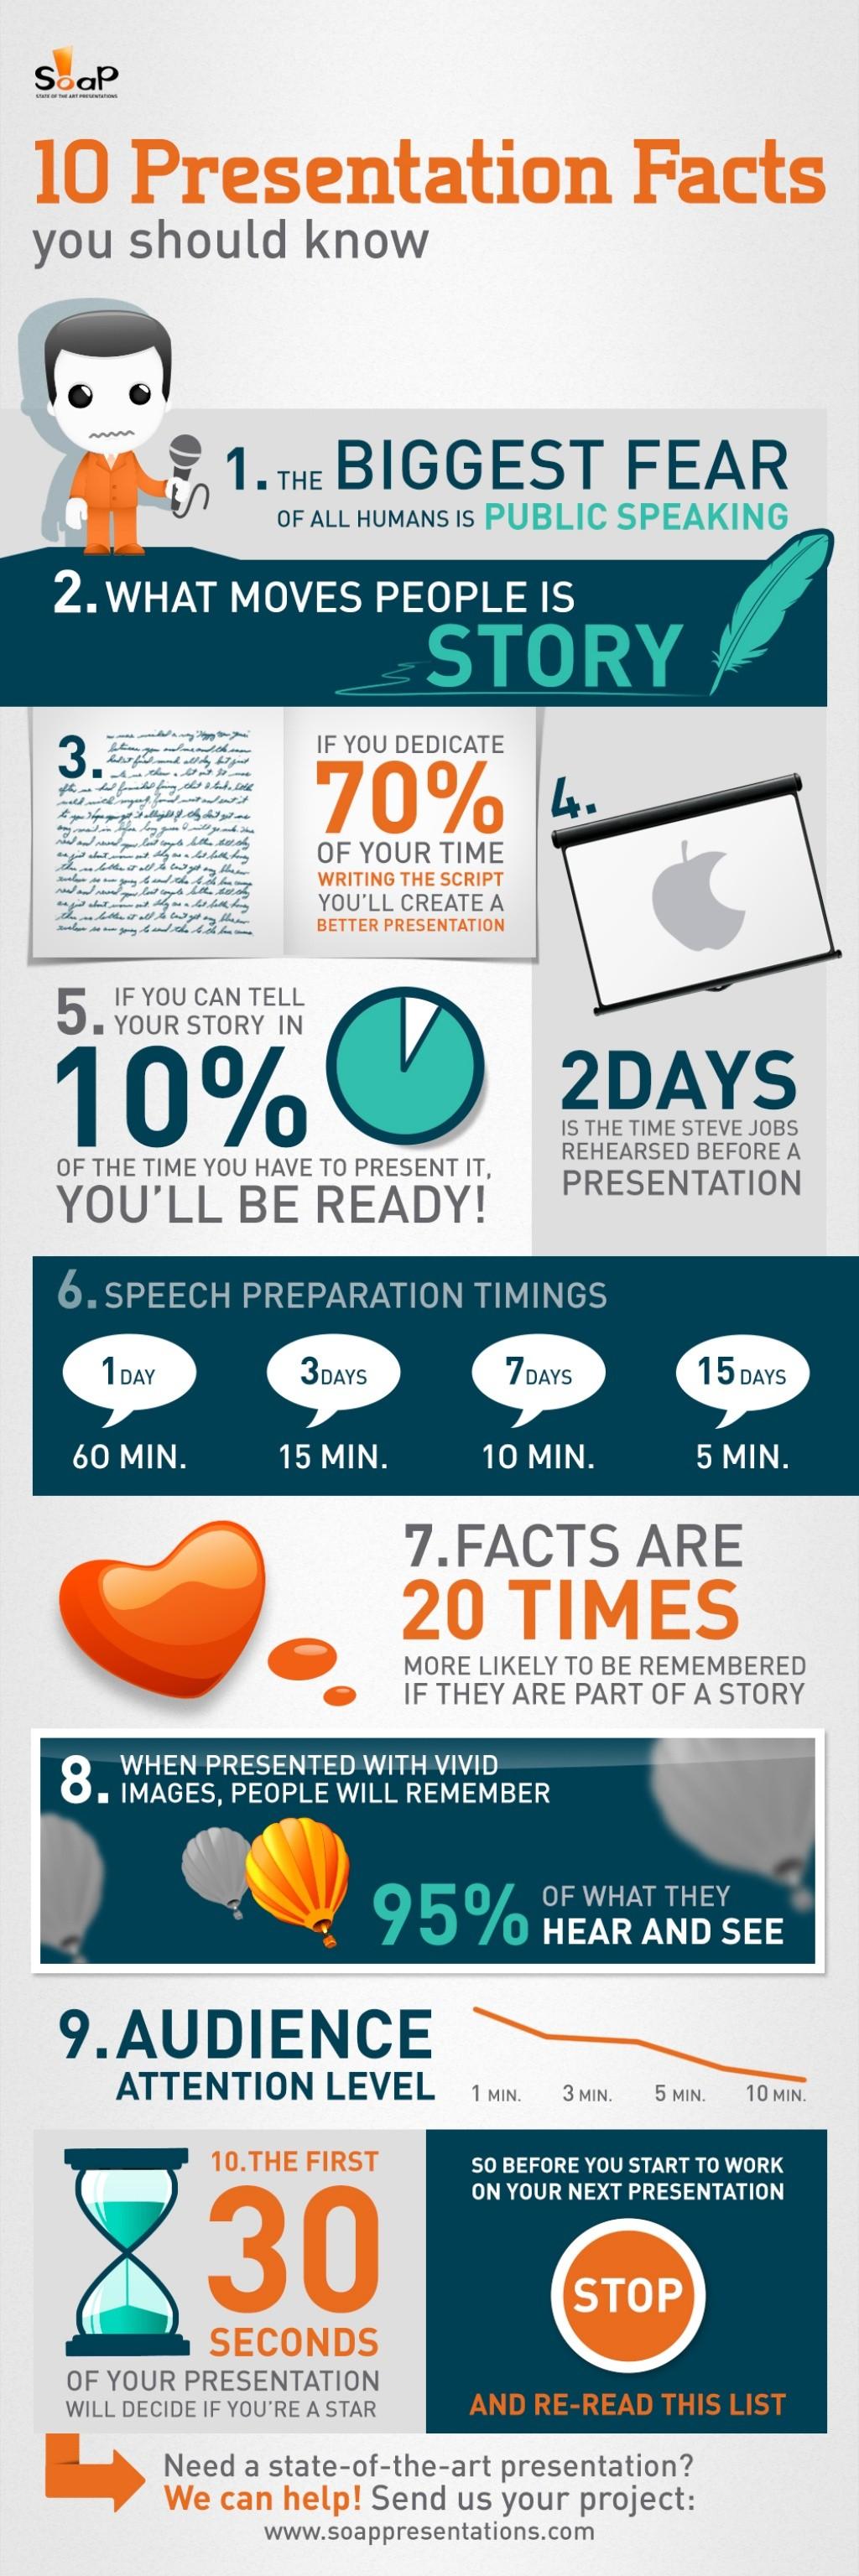 10 Presentation Facts